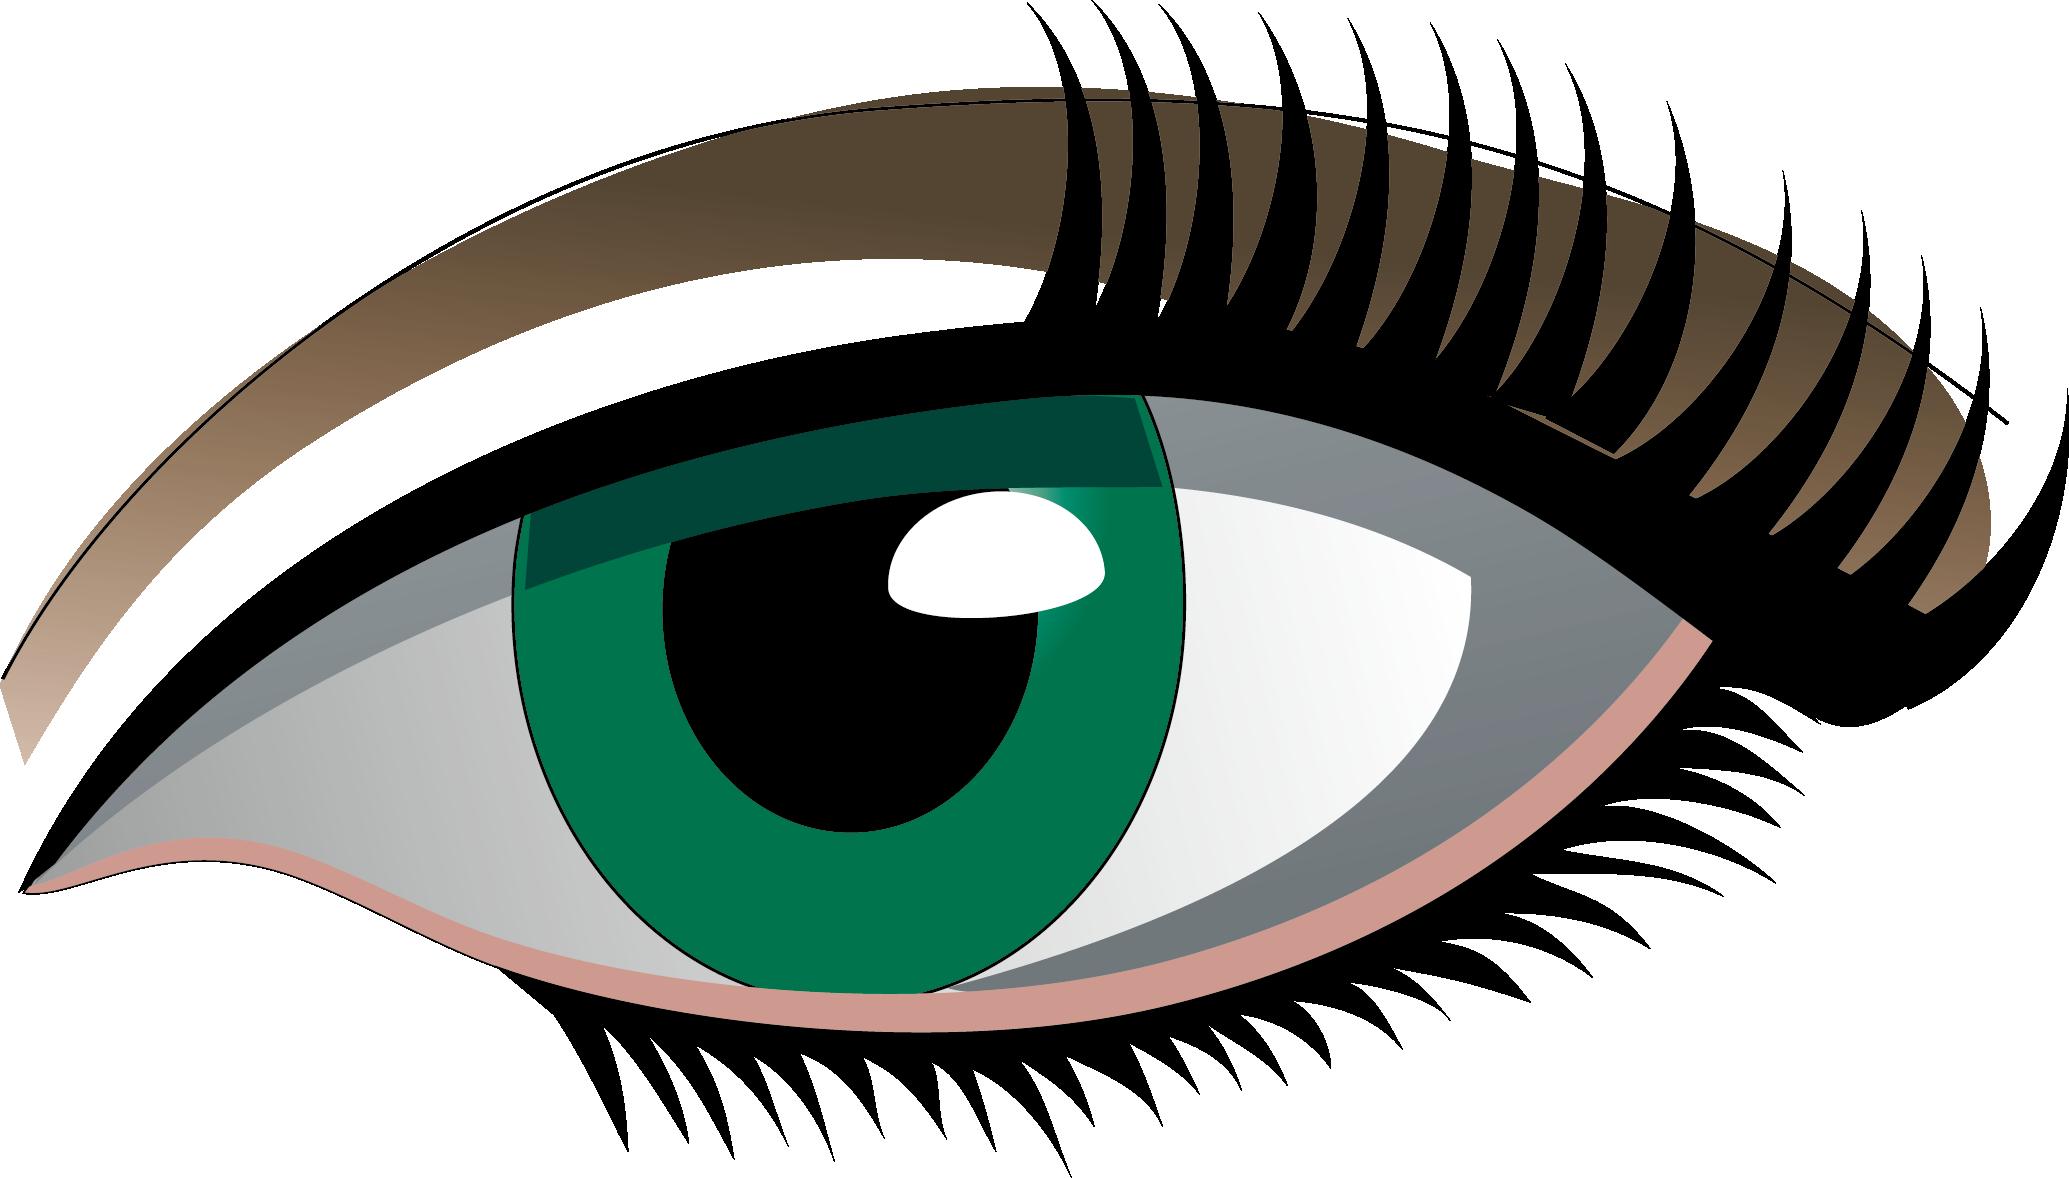 clipart library stock Eyelash Clipart simple eye